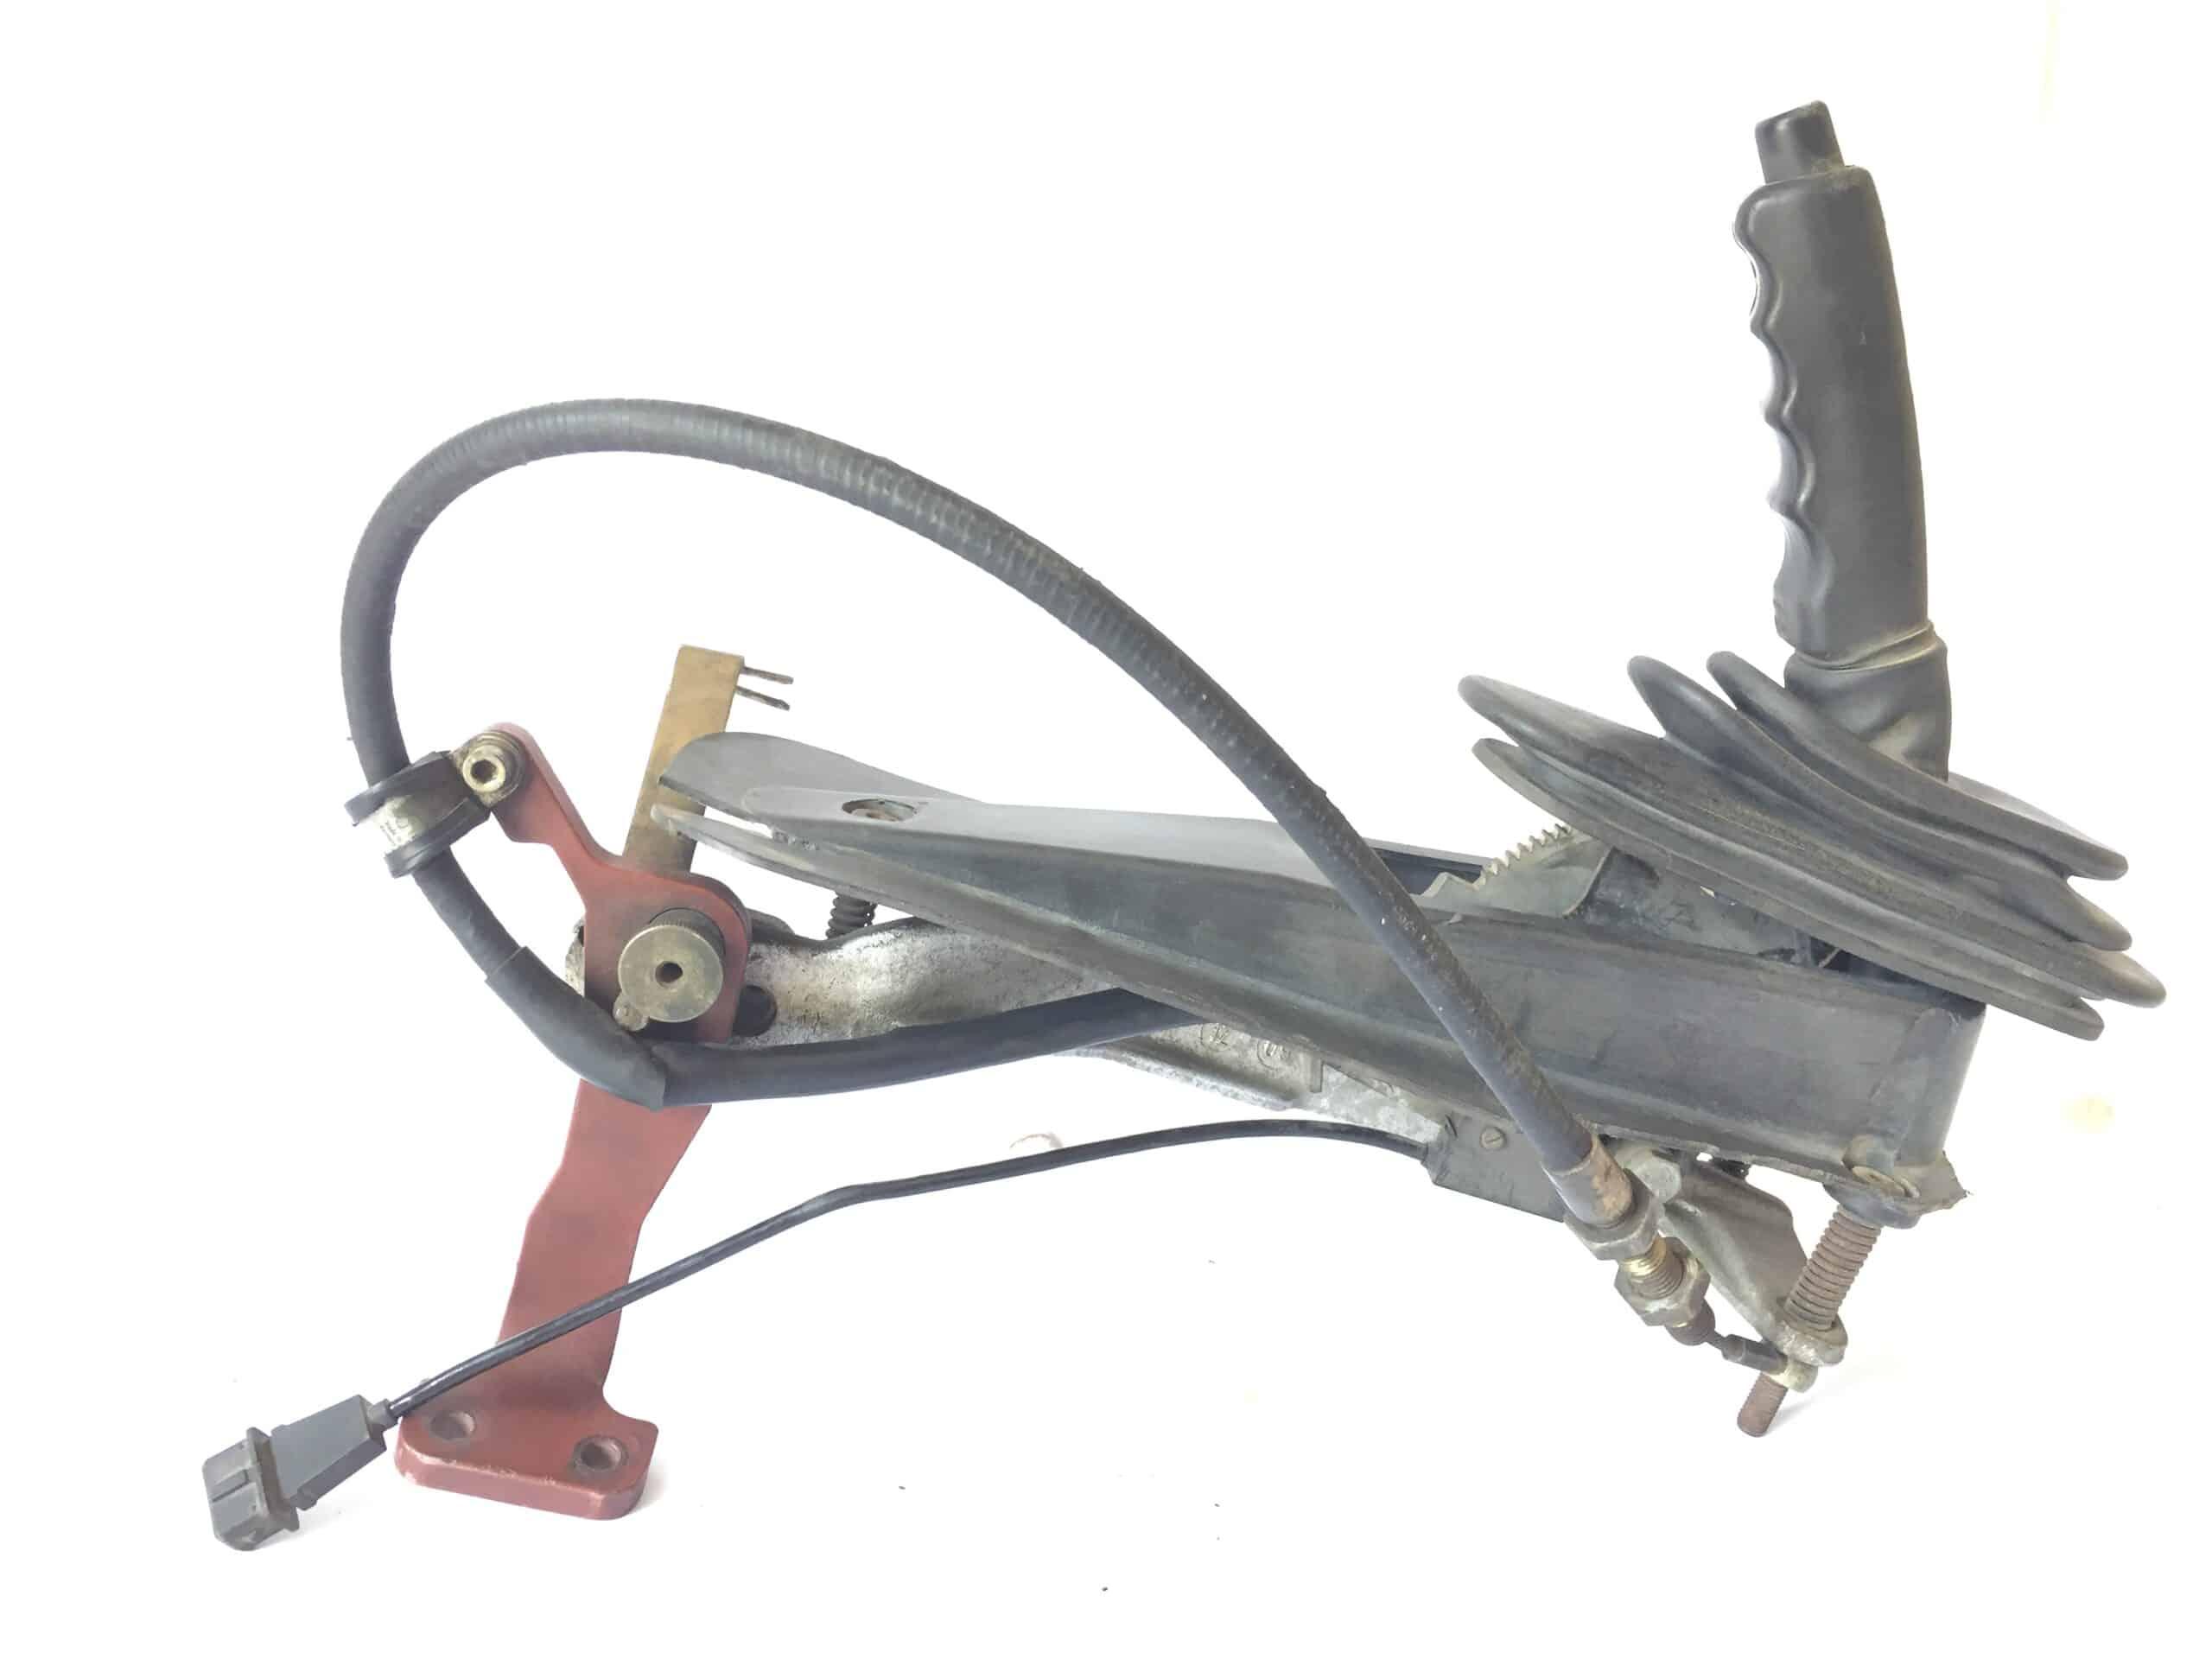 | Hand brake lever assy. | Fazl-e-Rasheed and Company August 2021